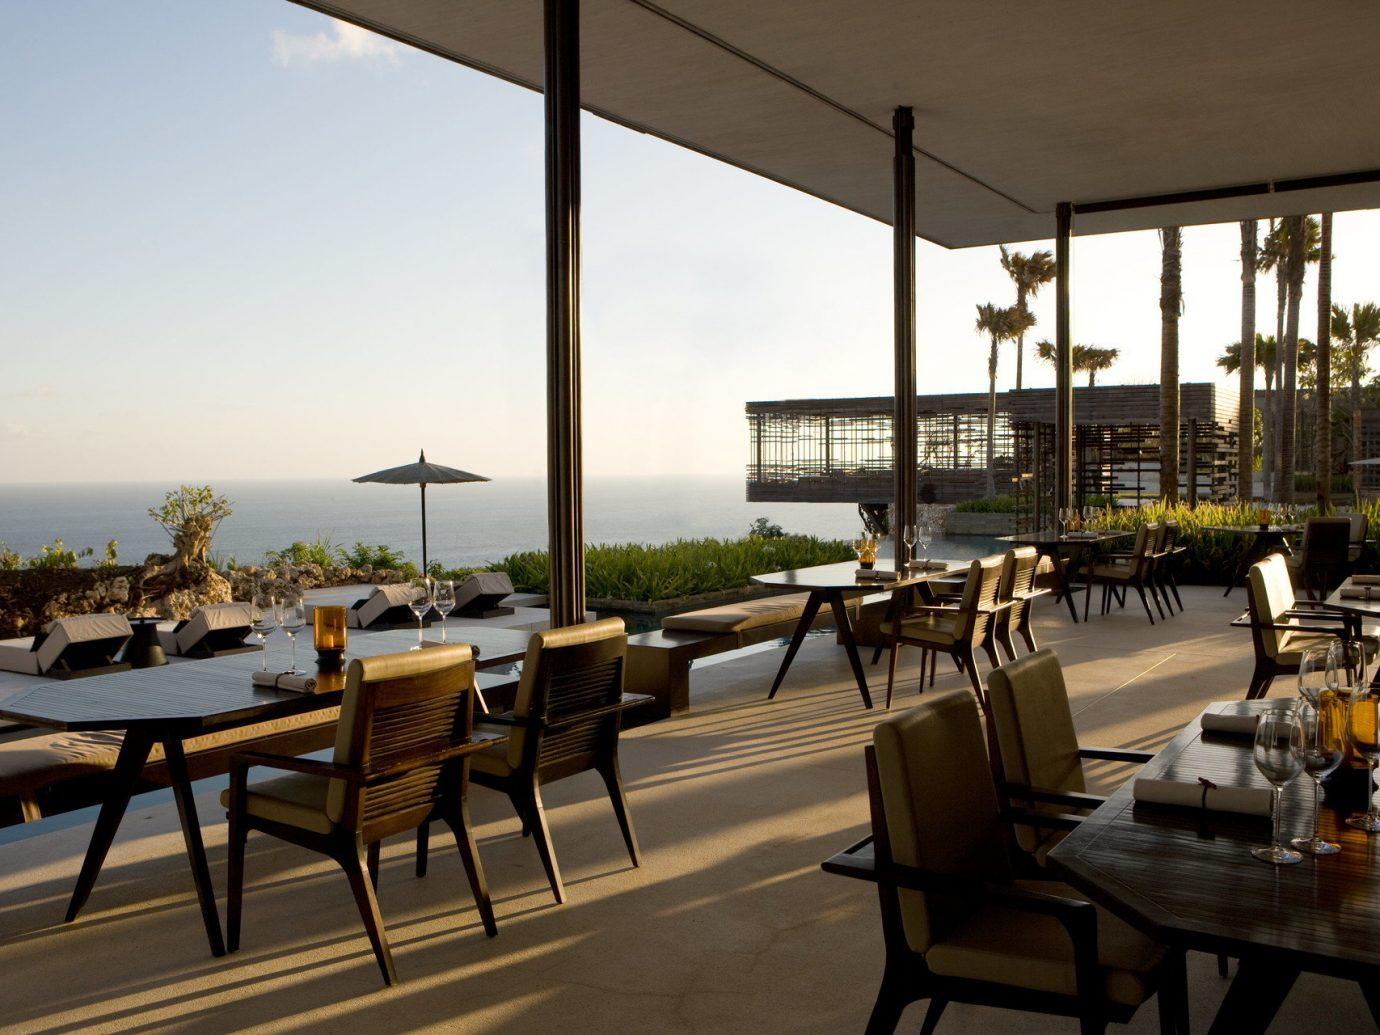 Health + Wellness Hotels sky table chair property restaurant Resort estate interior design condominium Villa Bar overlooking furniture set several